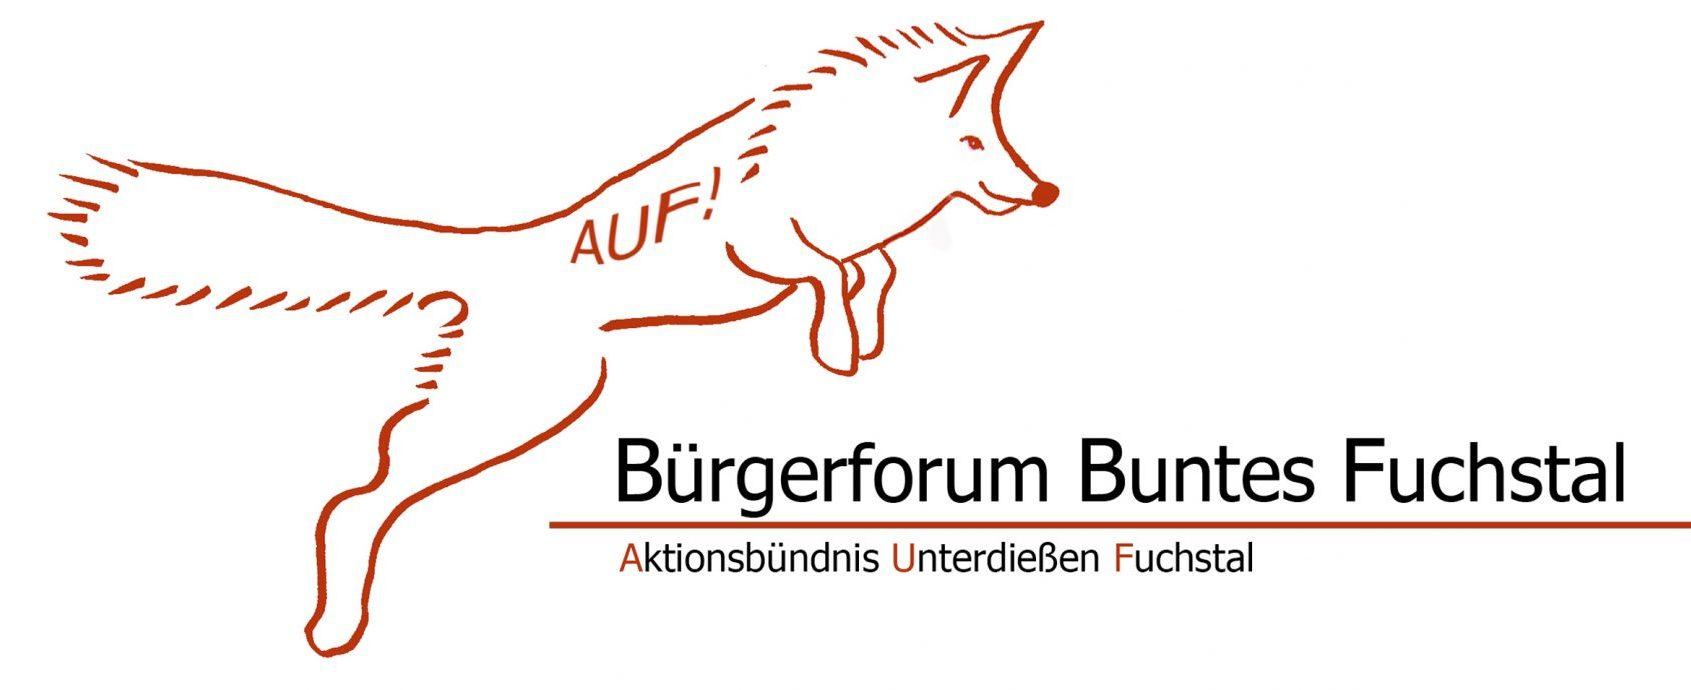 Buergerforum Buntes Fuchstal